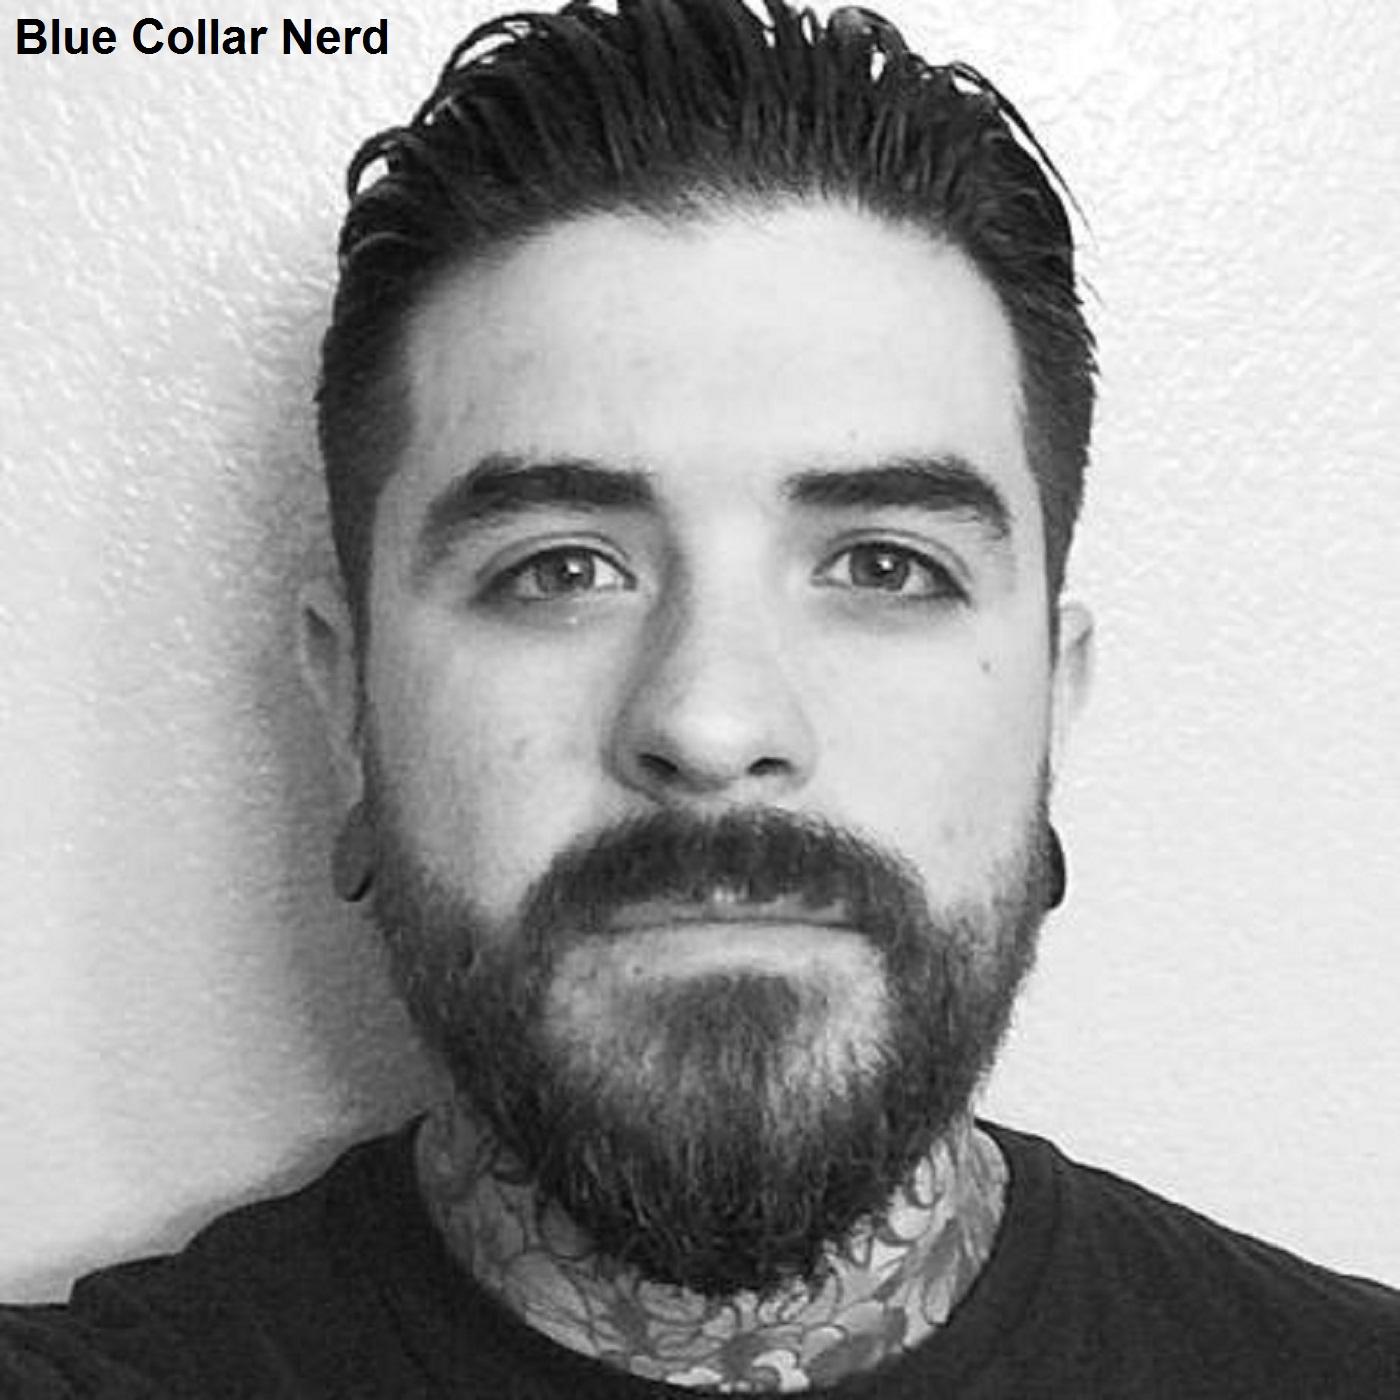 Blue Collar Nerd